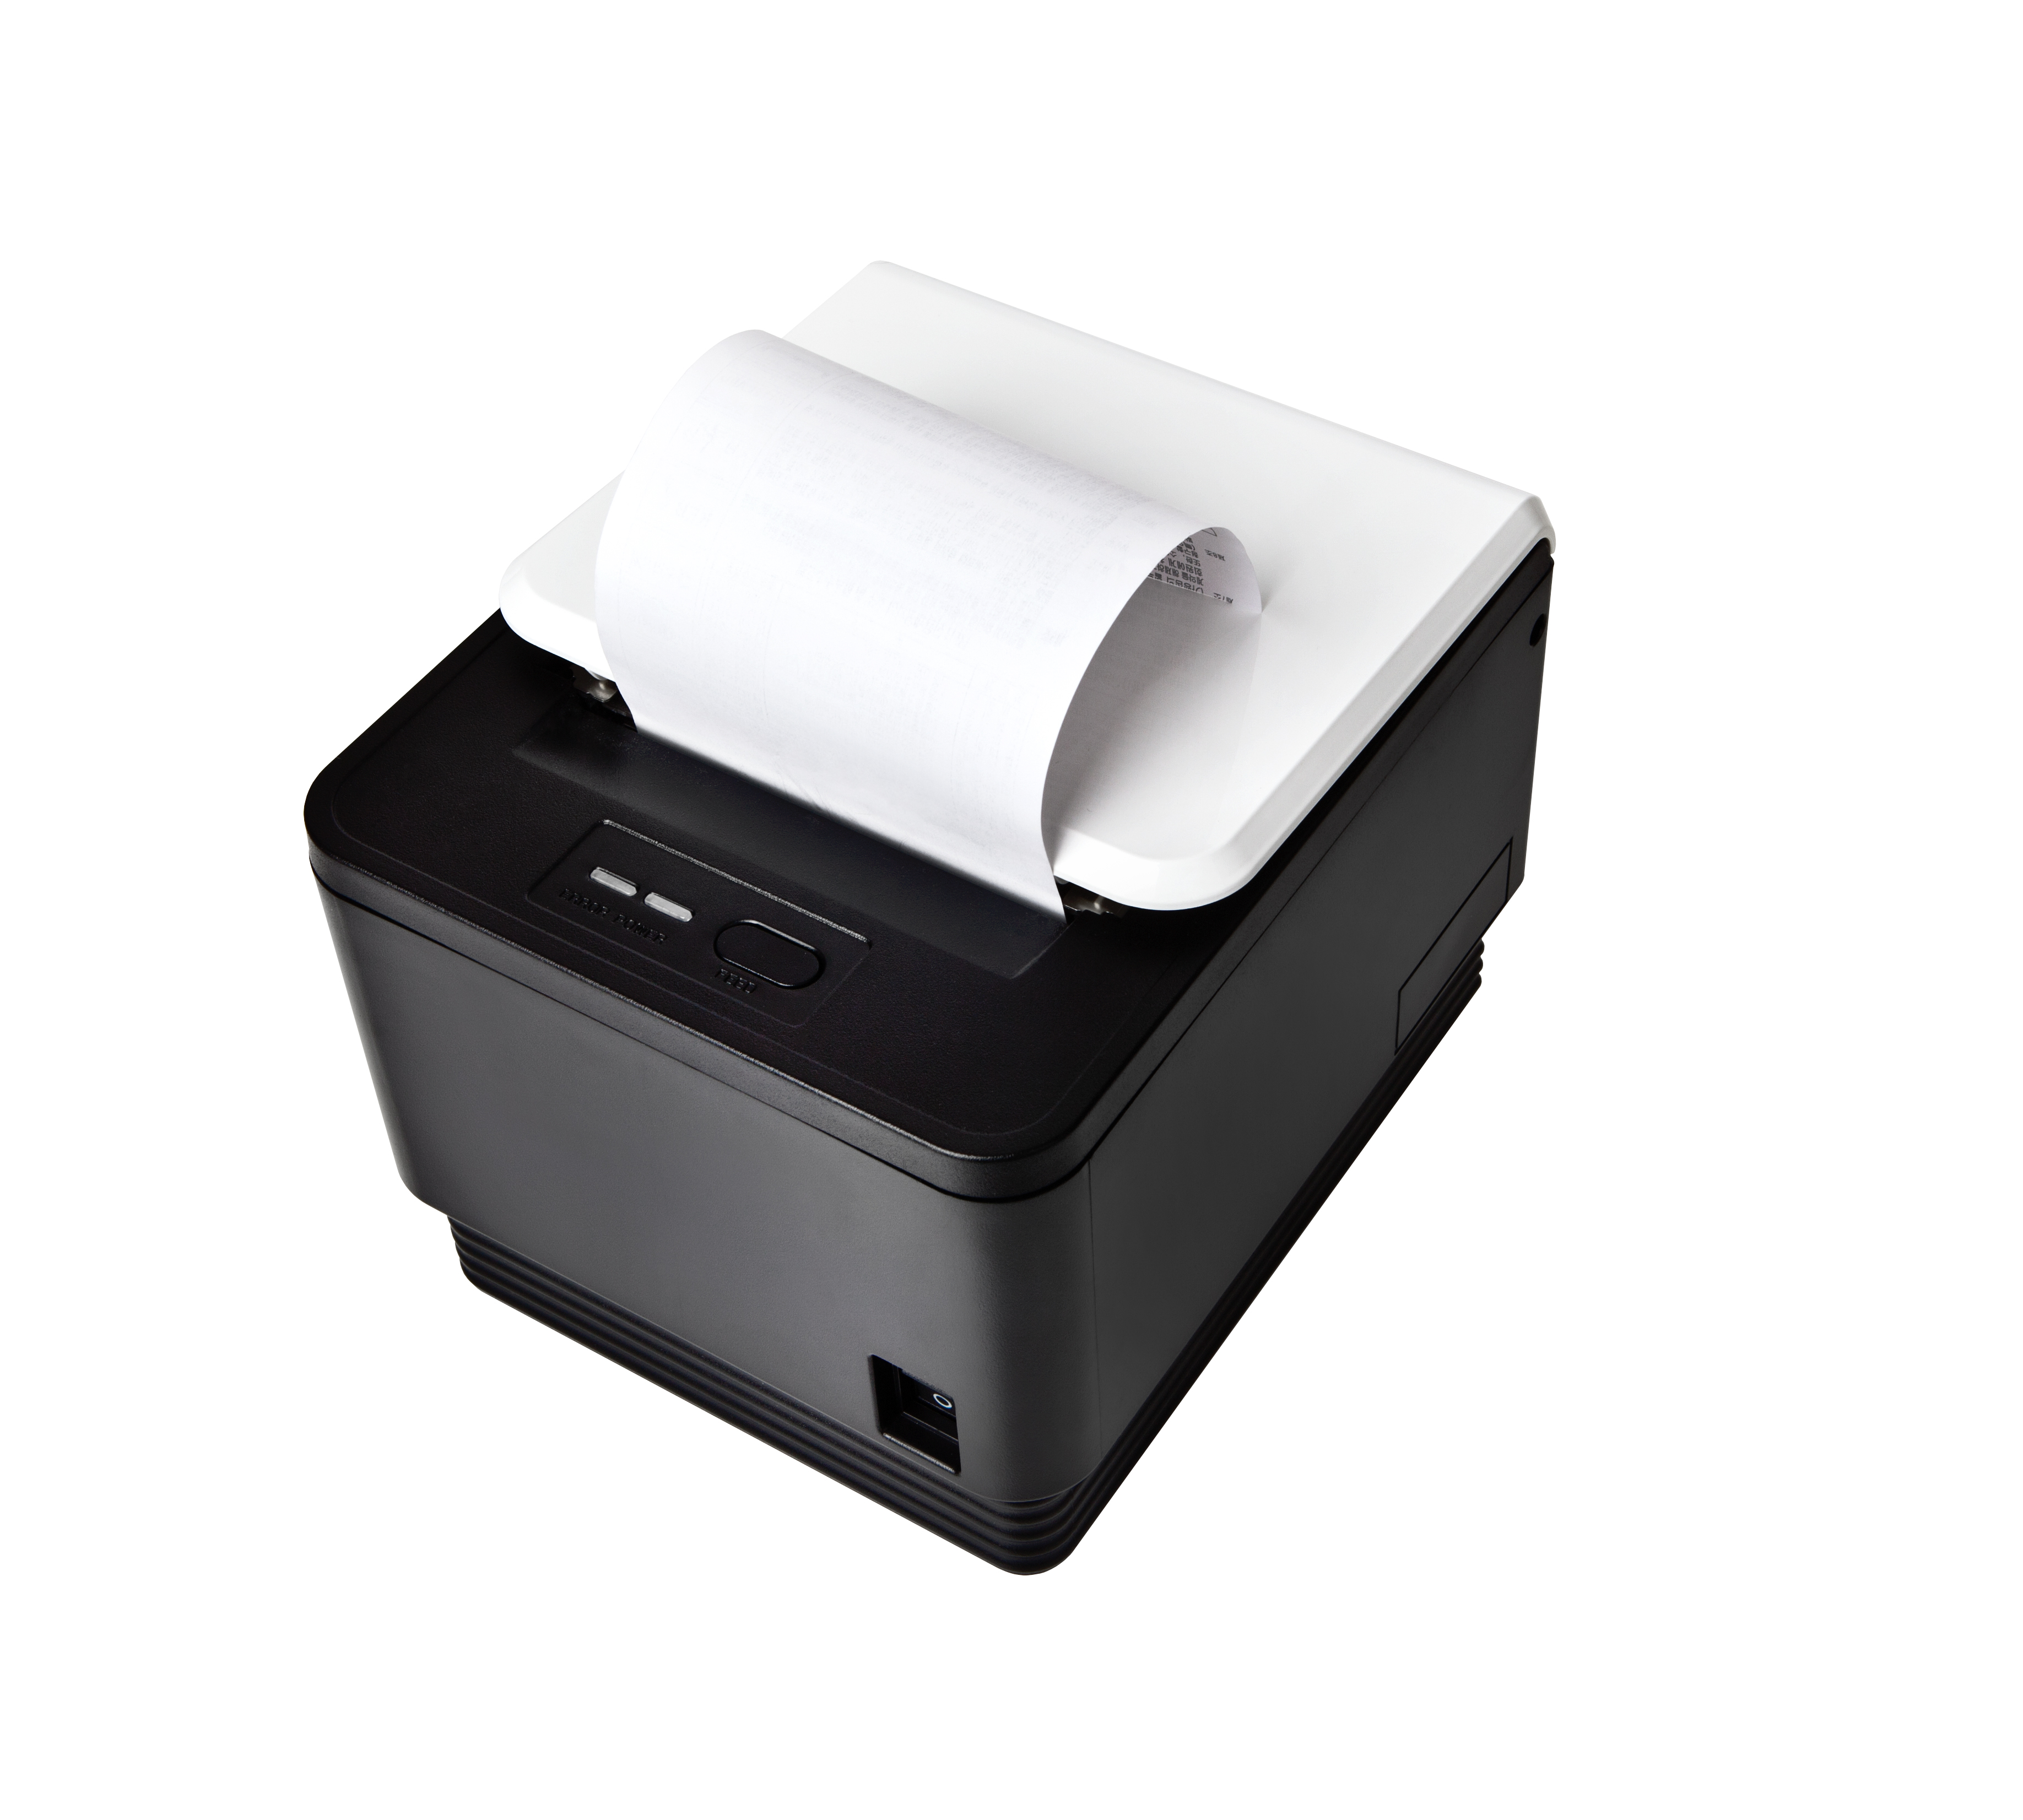 posbank-A7-receipt-printer-004.jpg